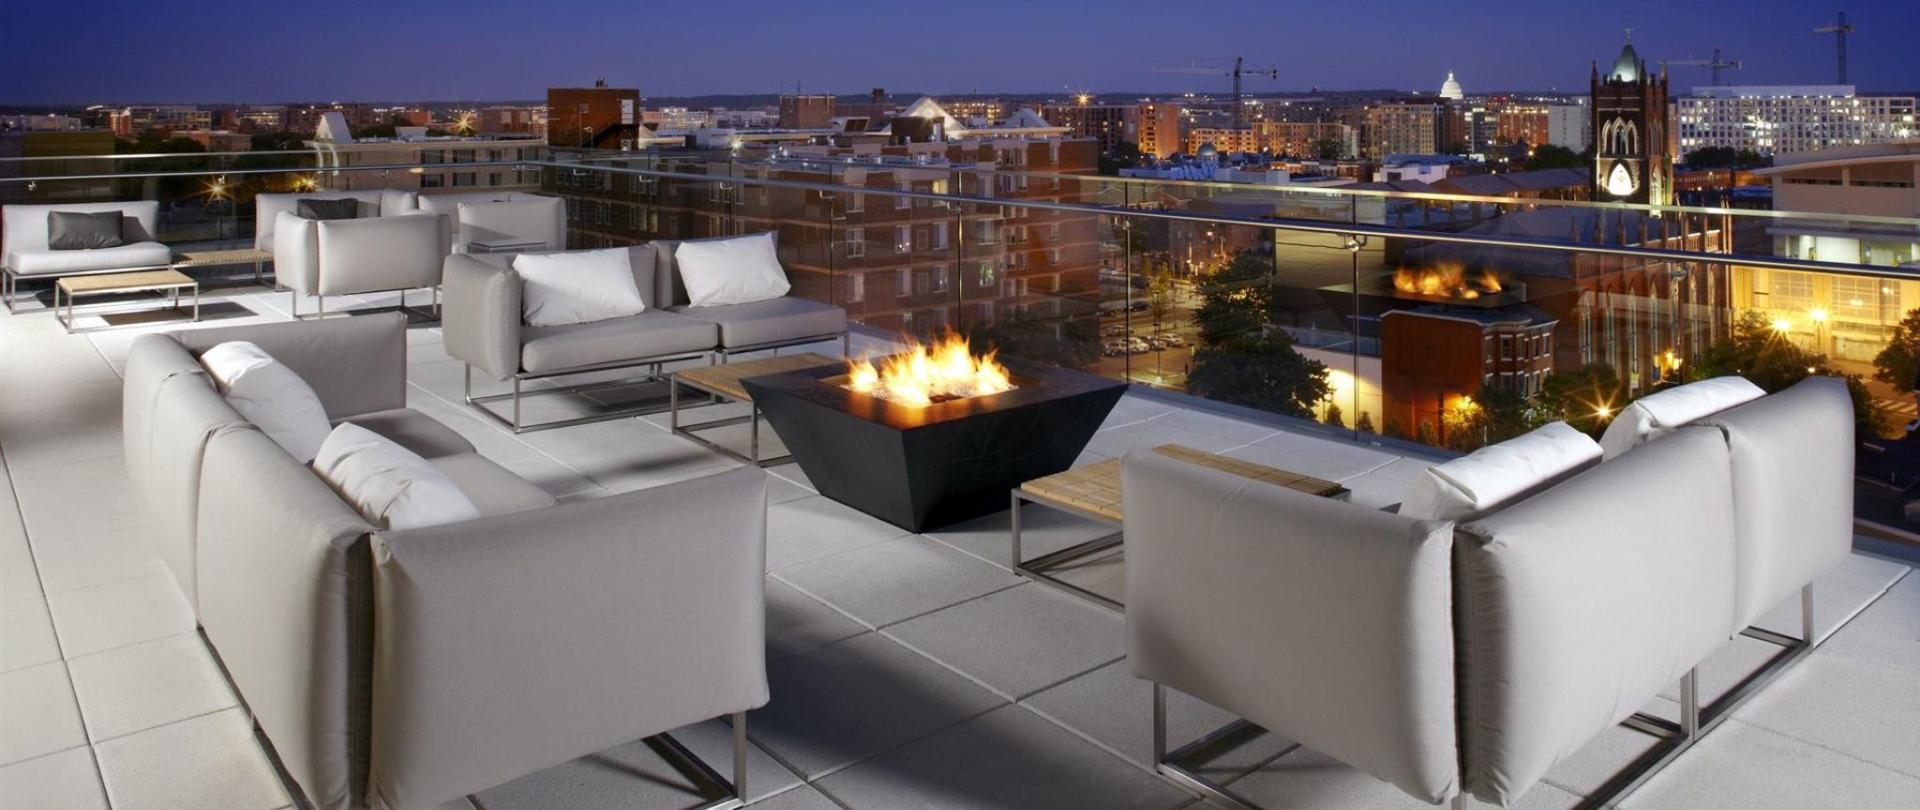 cam-dc-rooftop-patio-night-20141.jpg